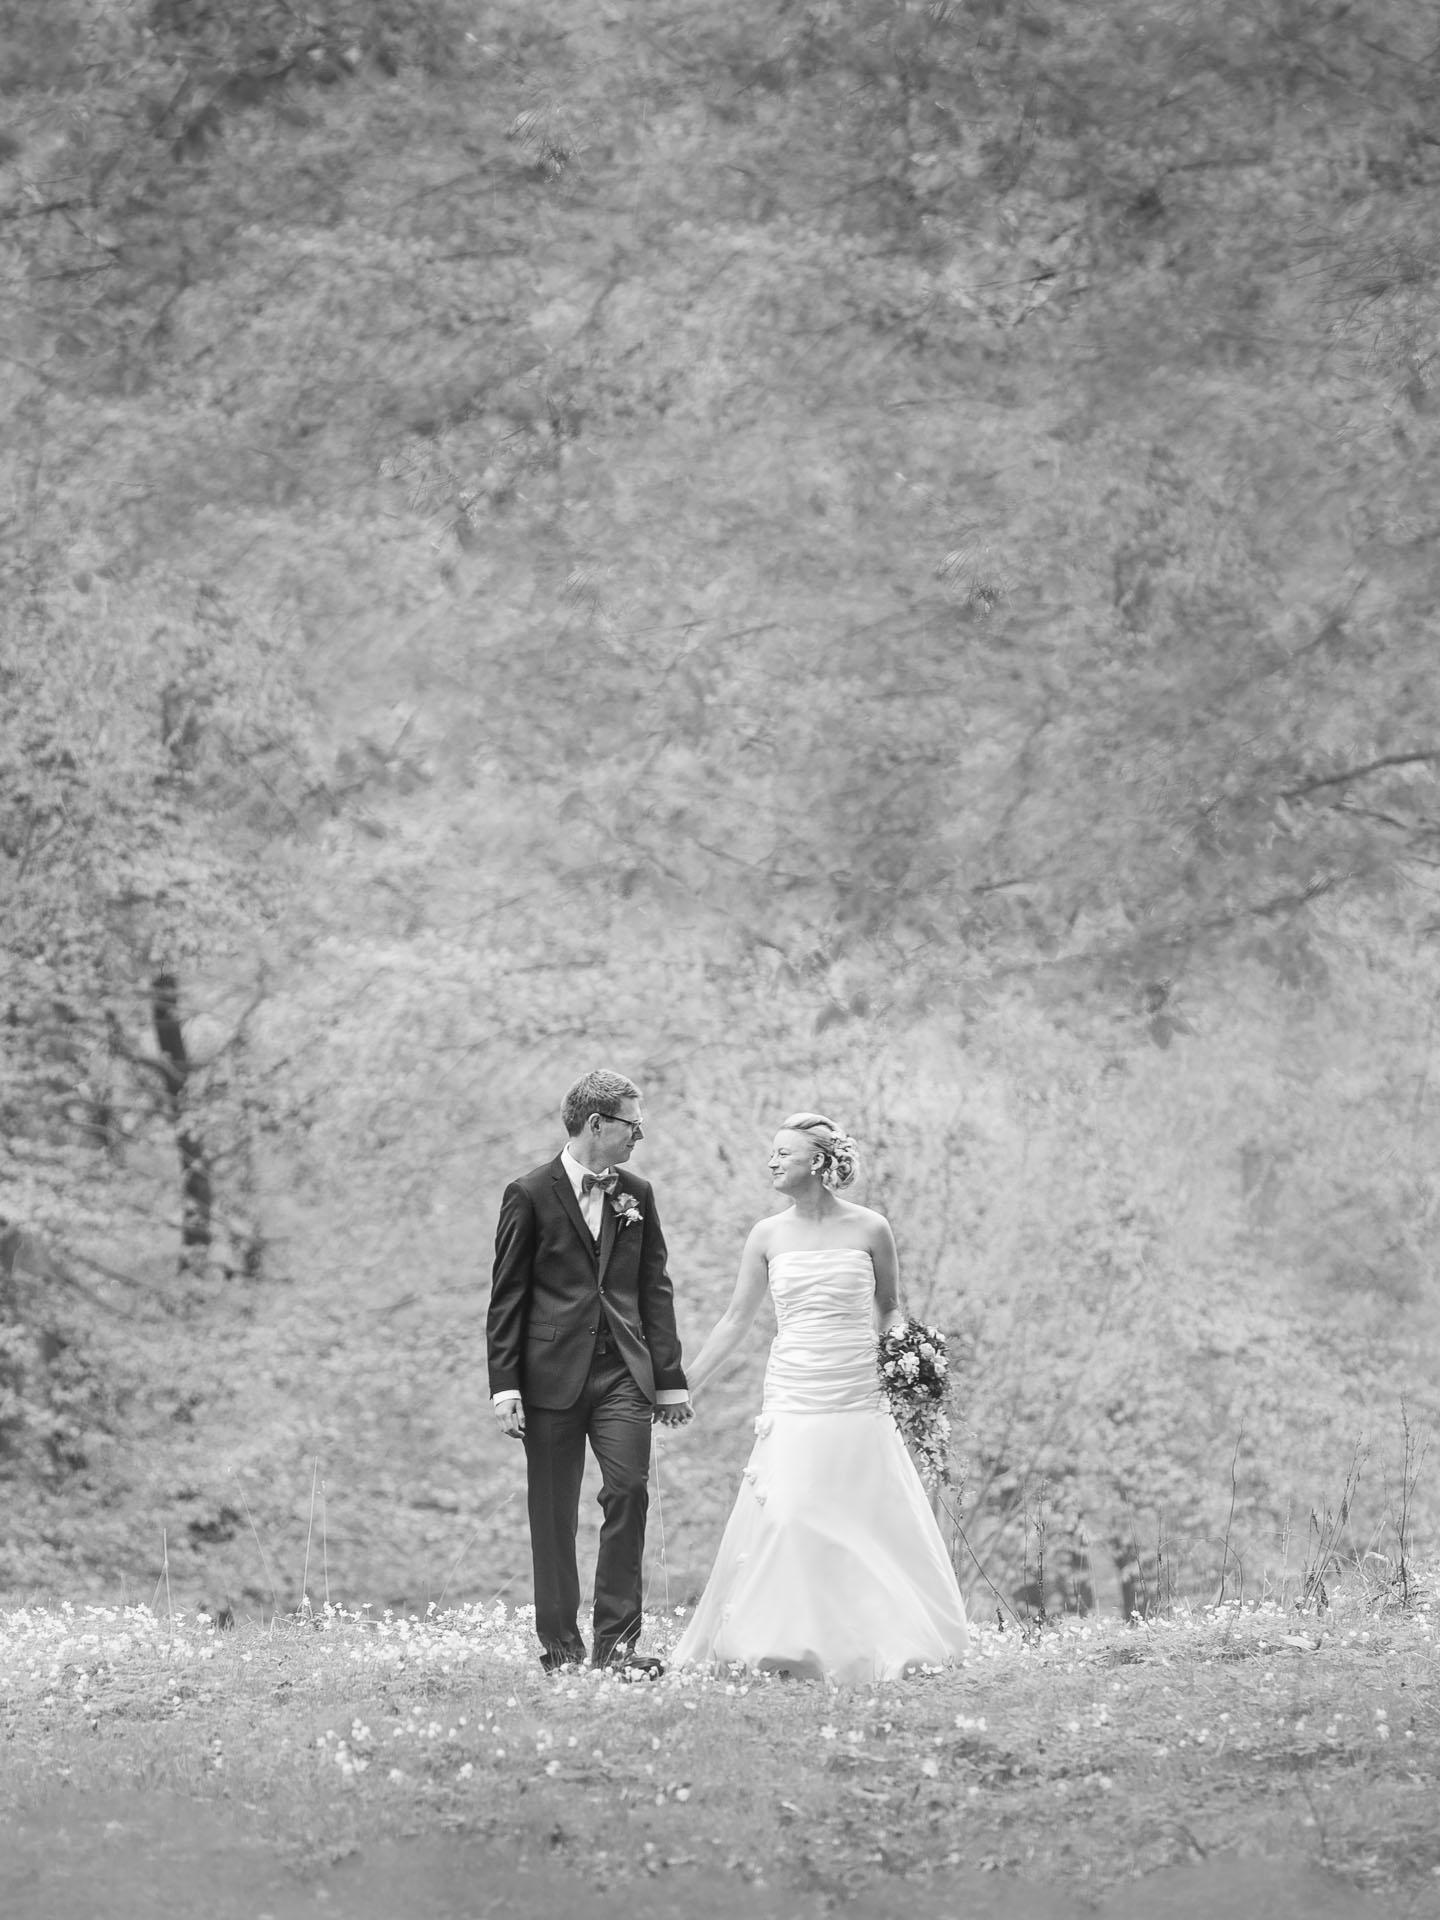 bröllopsfotograf, almnäs, hjo, tidaholm, sverige, wedding photographer, sweden